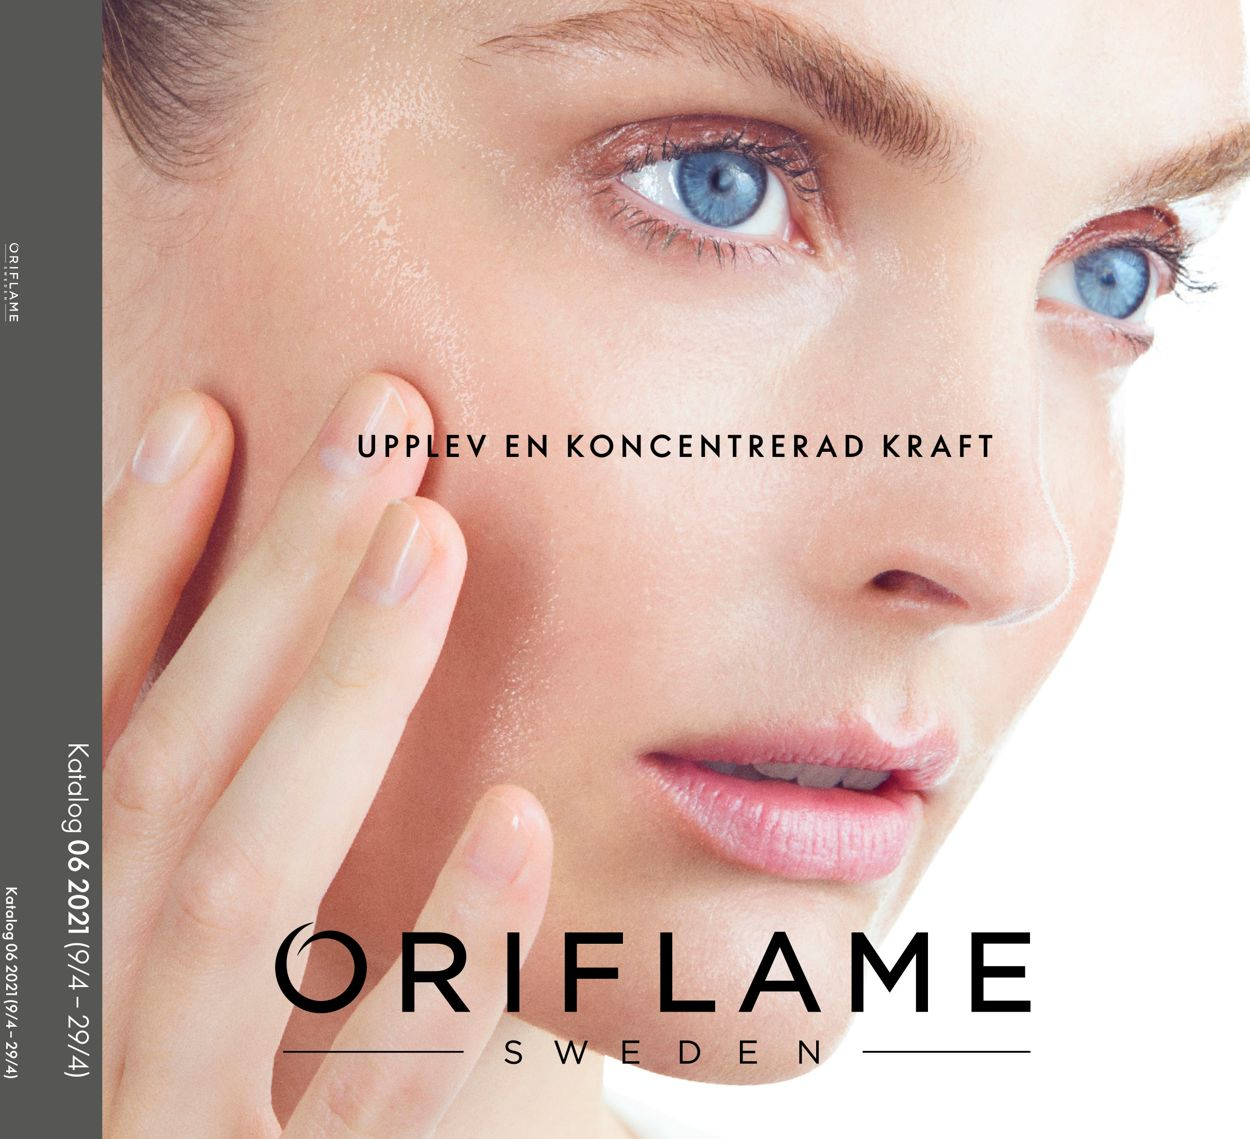 Reklamblad Oriflame från 09/04-2021